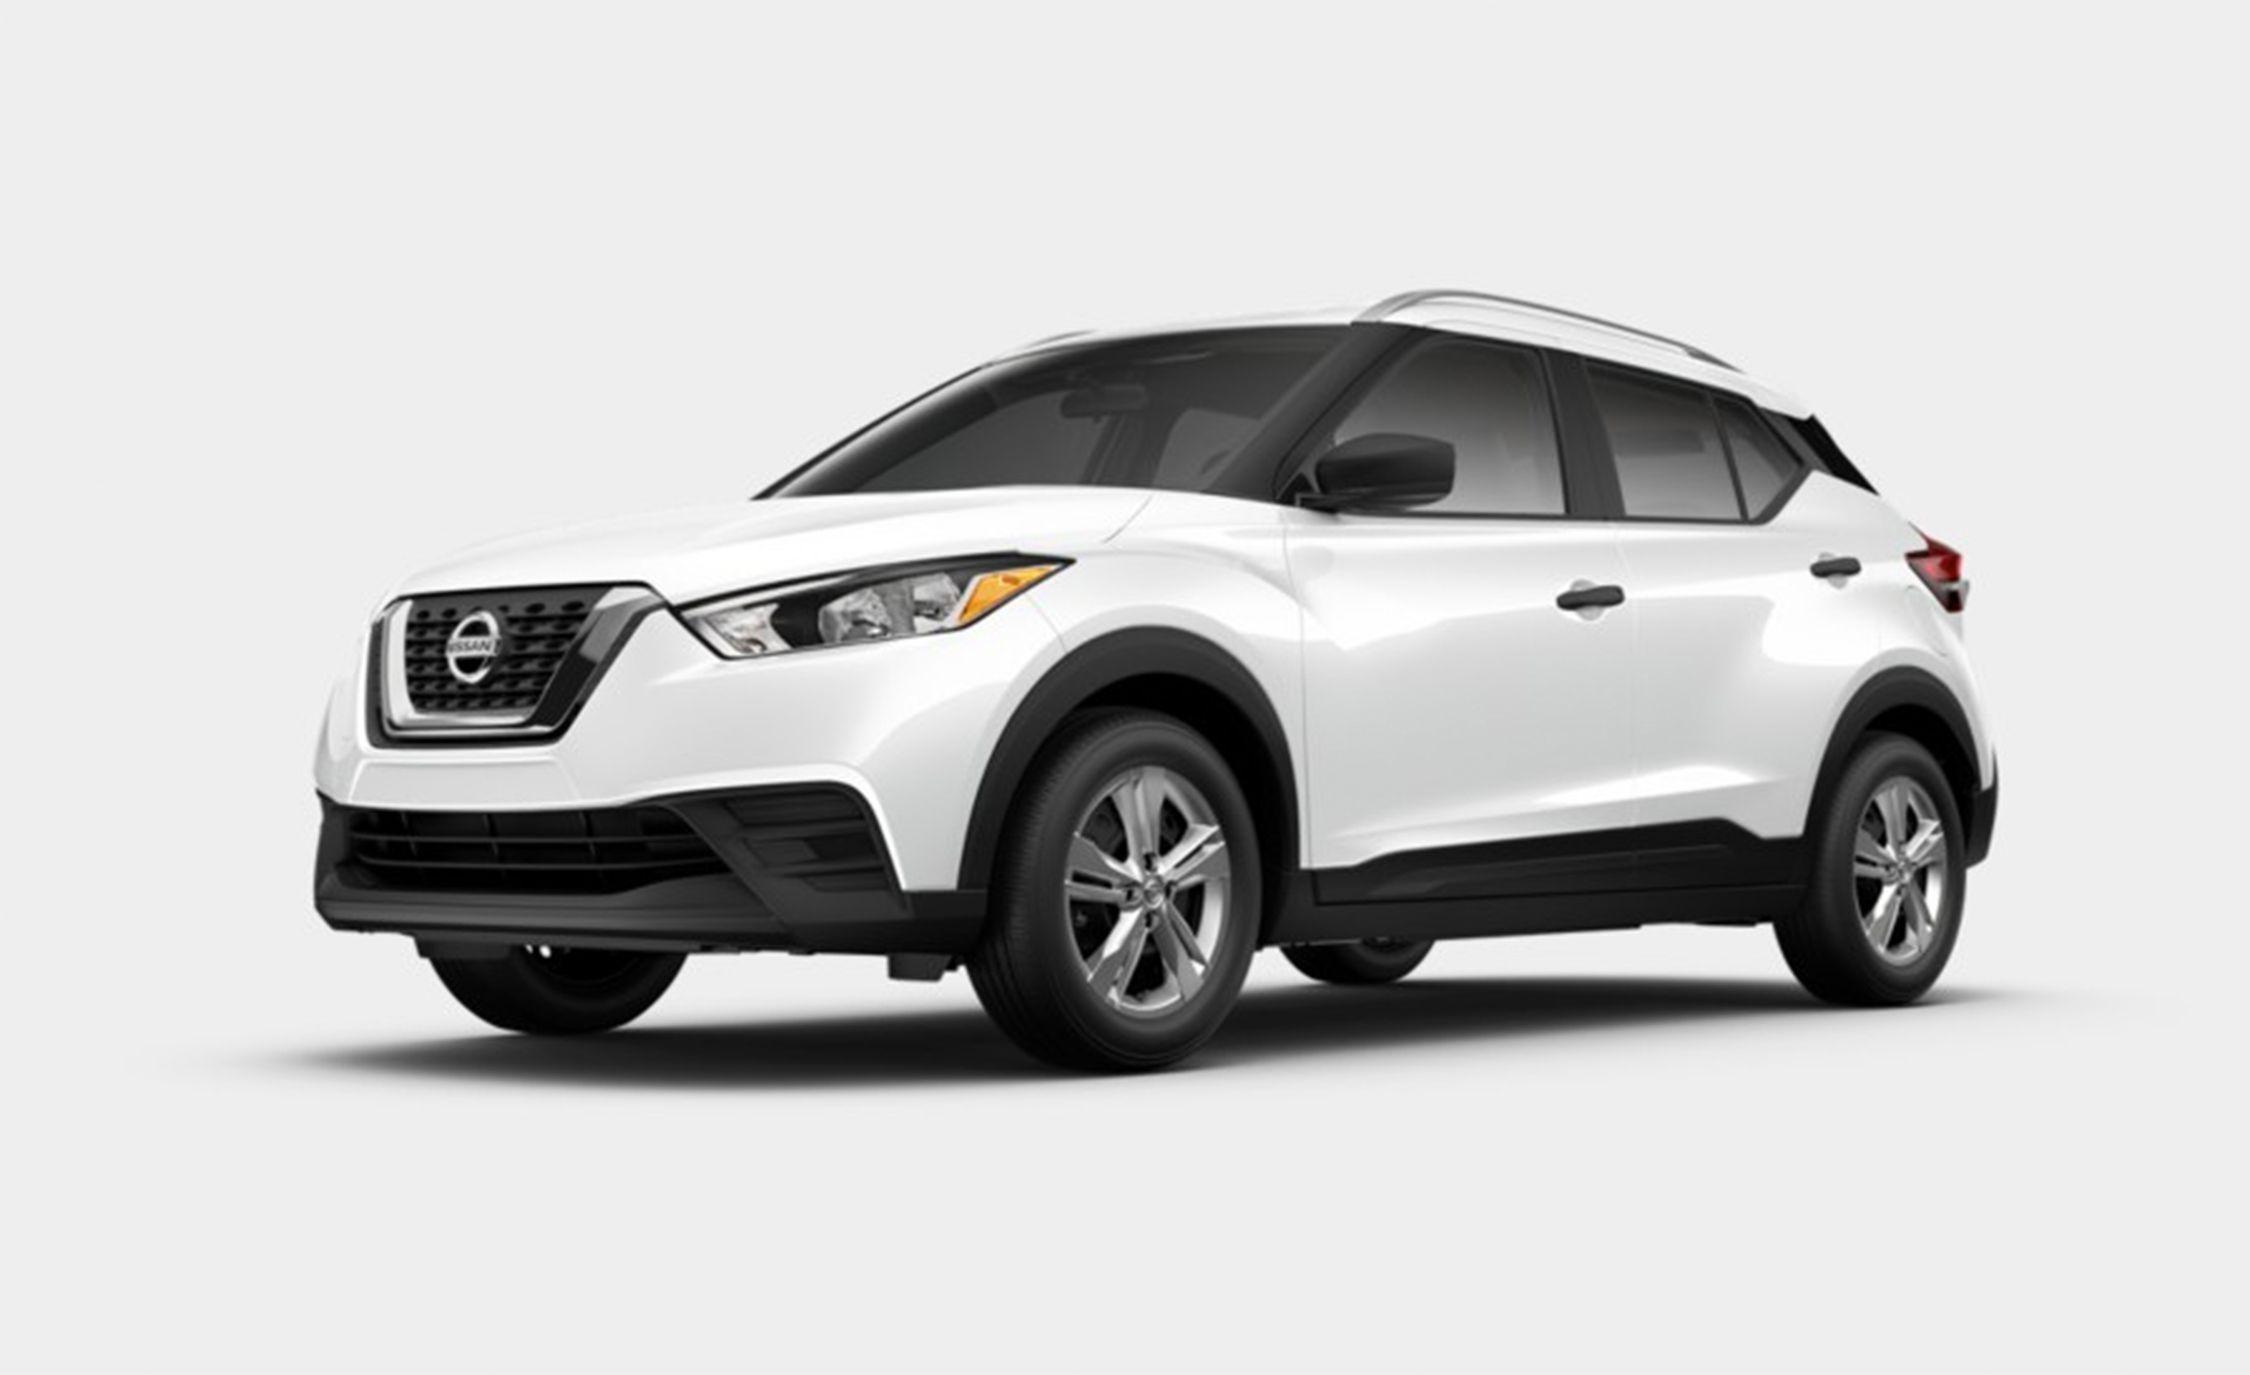 2019 Nissan Kicks base